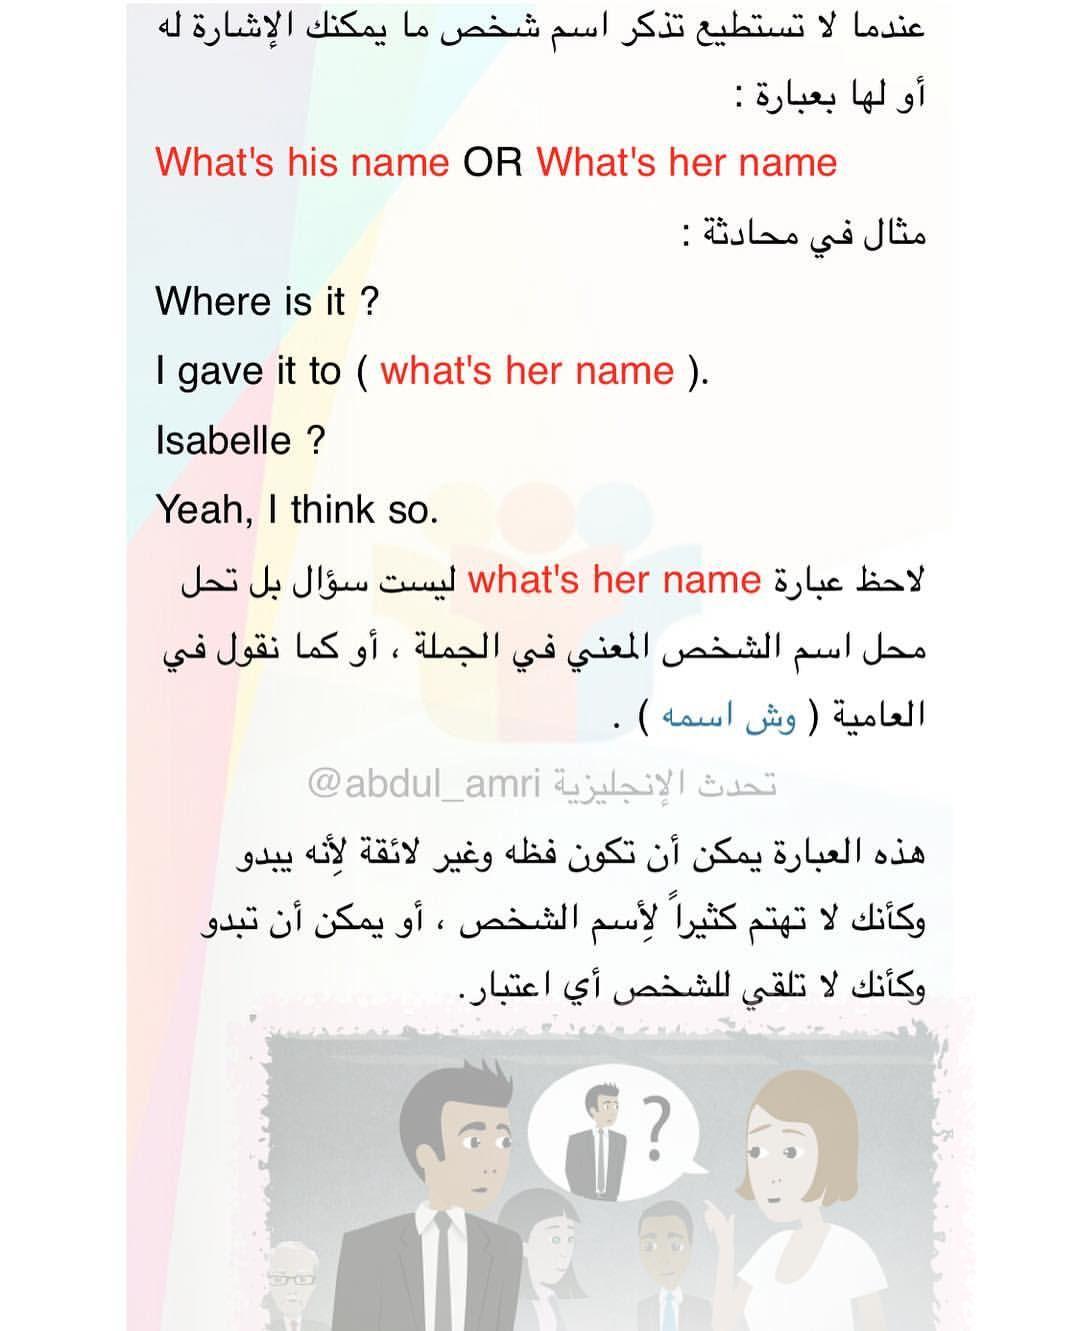 Pin By Nadih Koko On تعلم الانجليزية للمبتدئين Words Word Search Puzzle Names